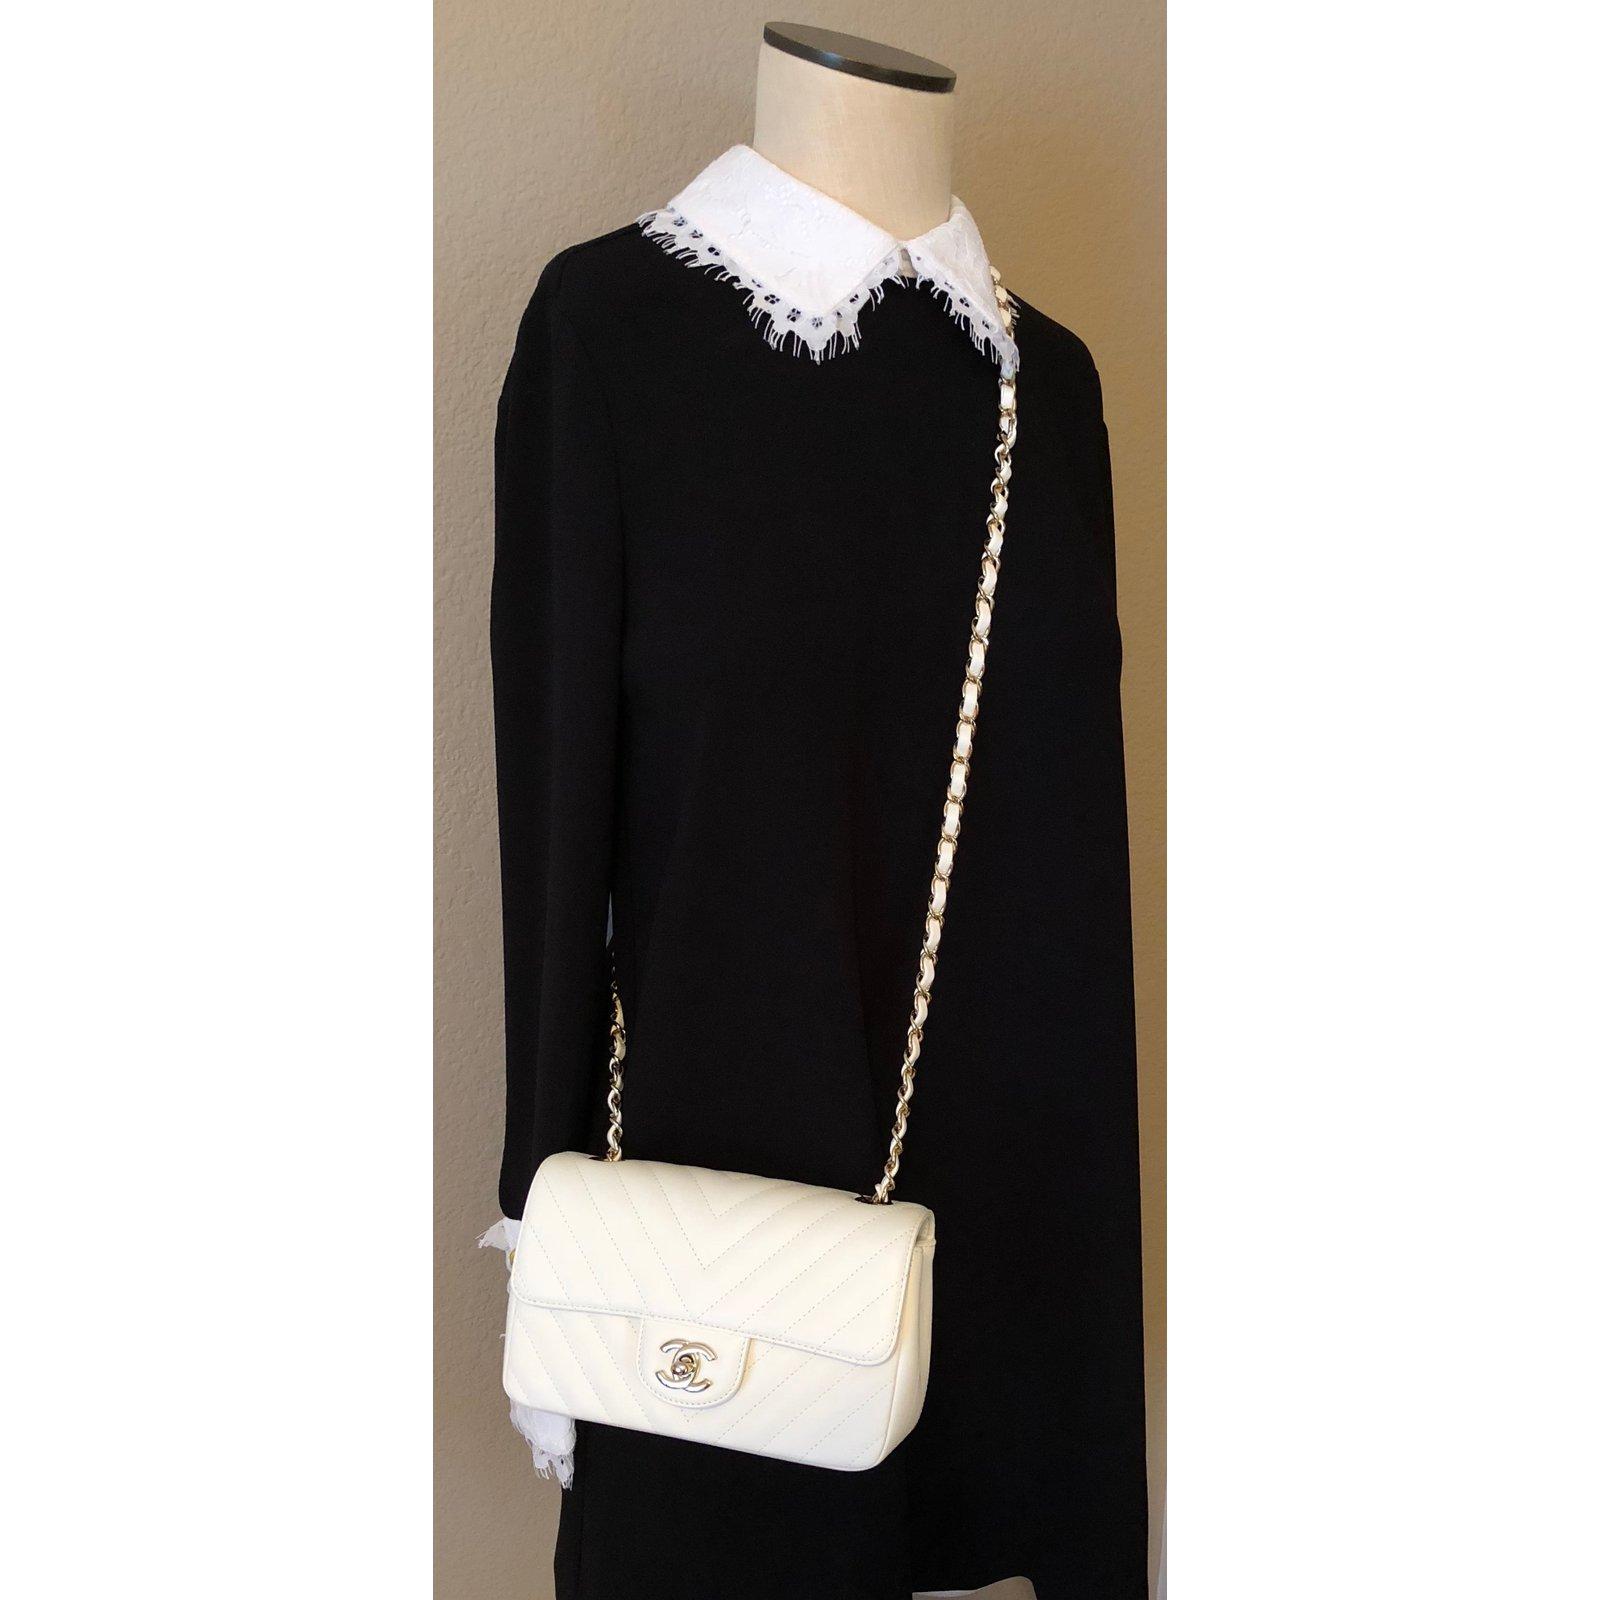 3c632e66de6ae Chanel Mini Flap Ivory Lambskin with Shiny Light Gold Chain Handbags  Leather White ref.65216 - Joli Closet